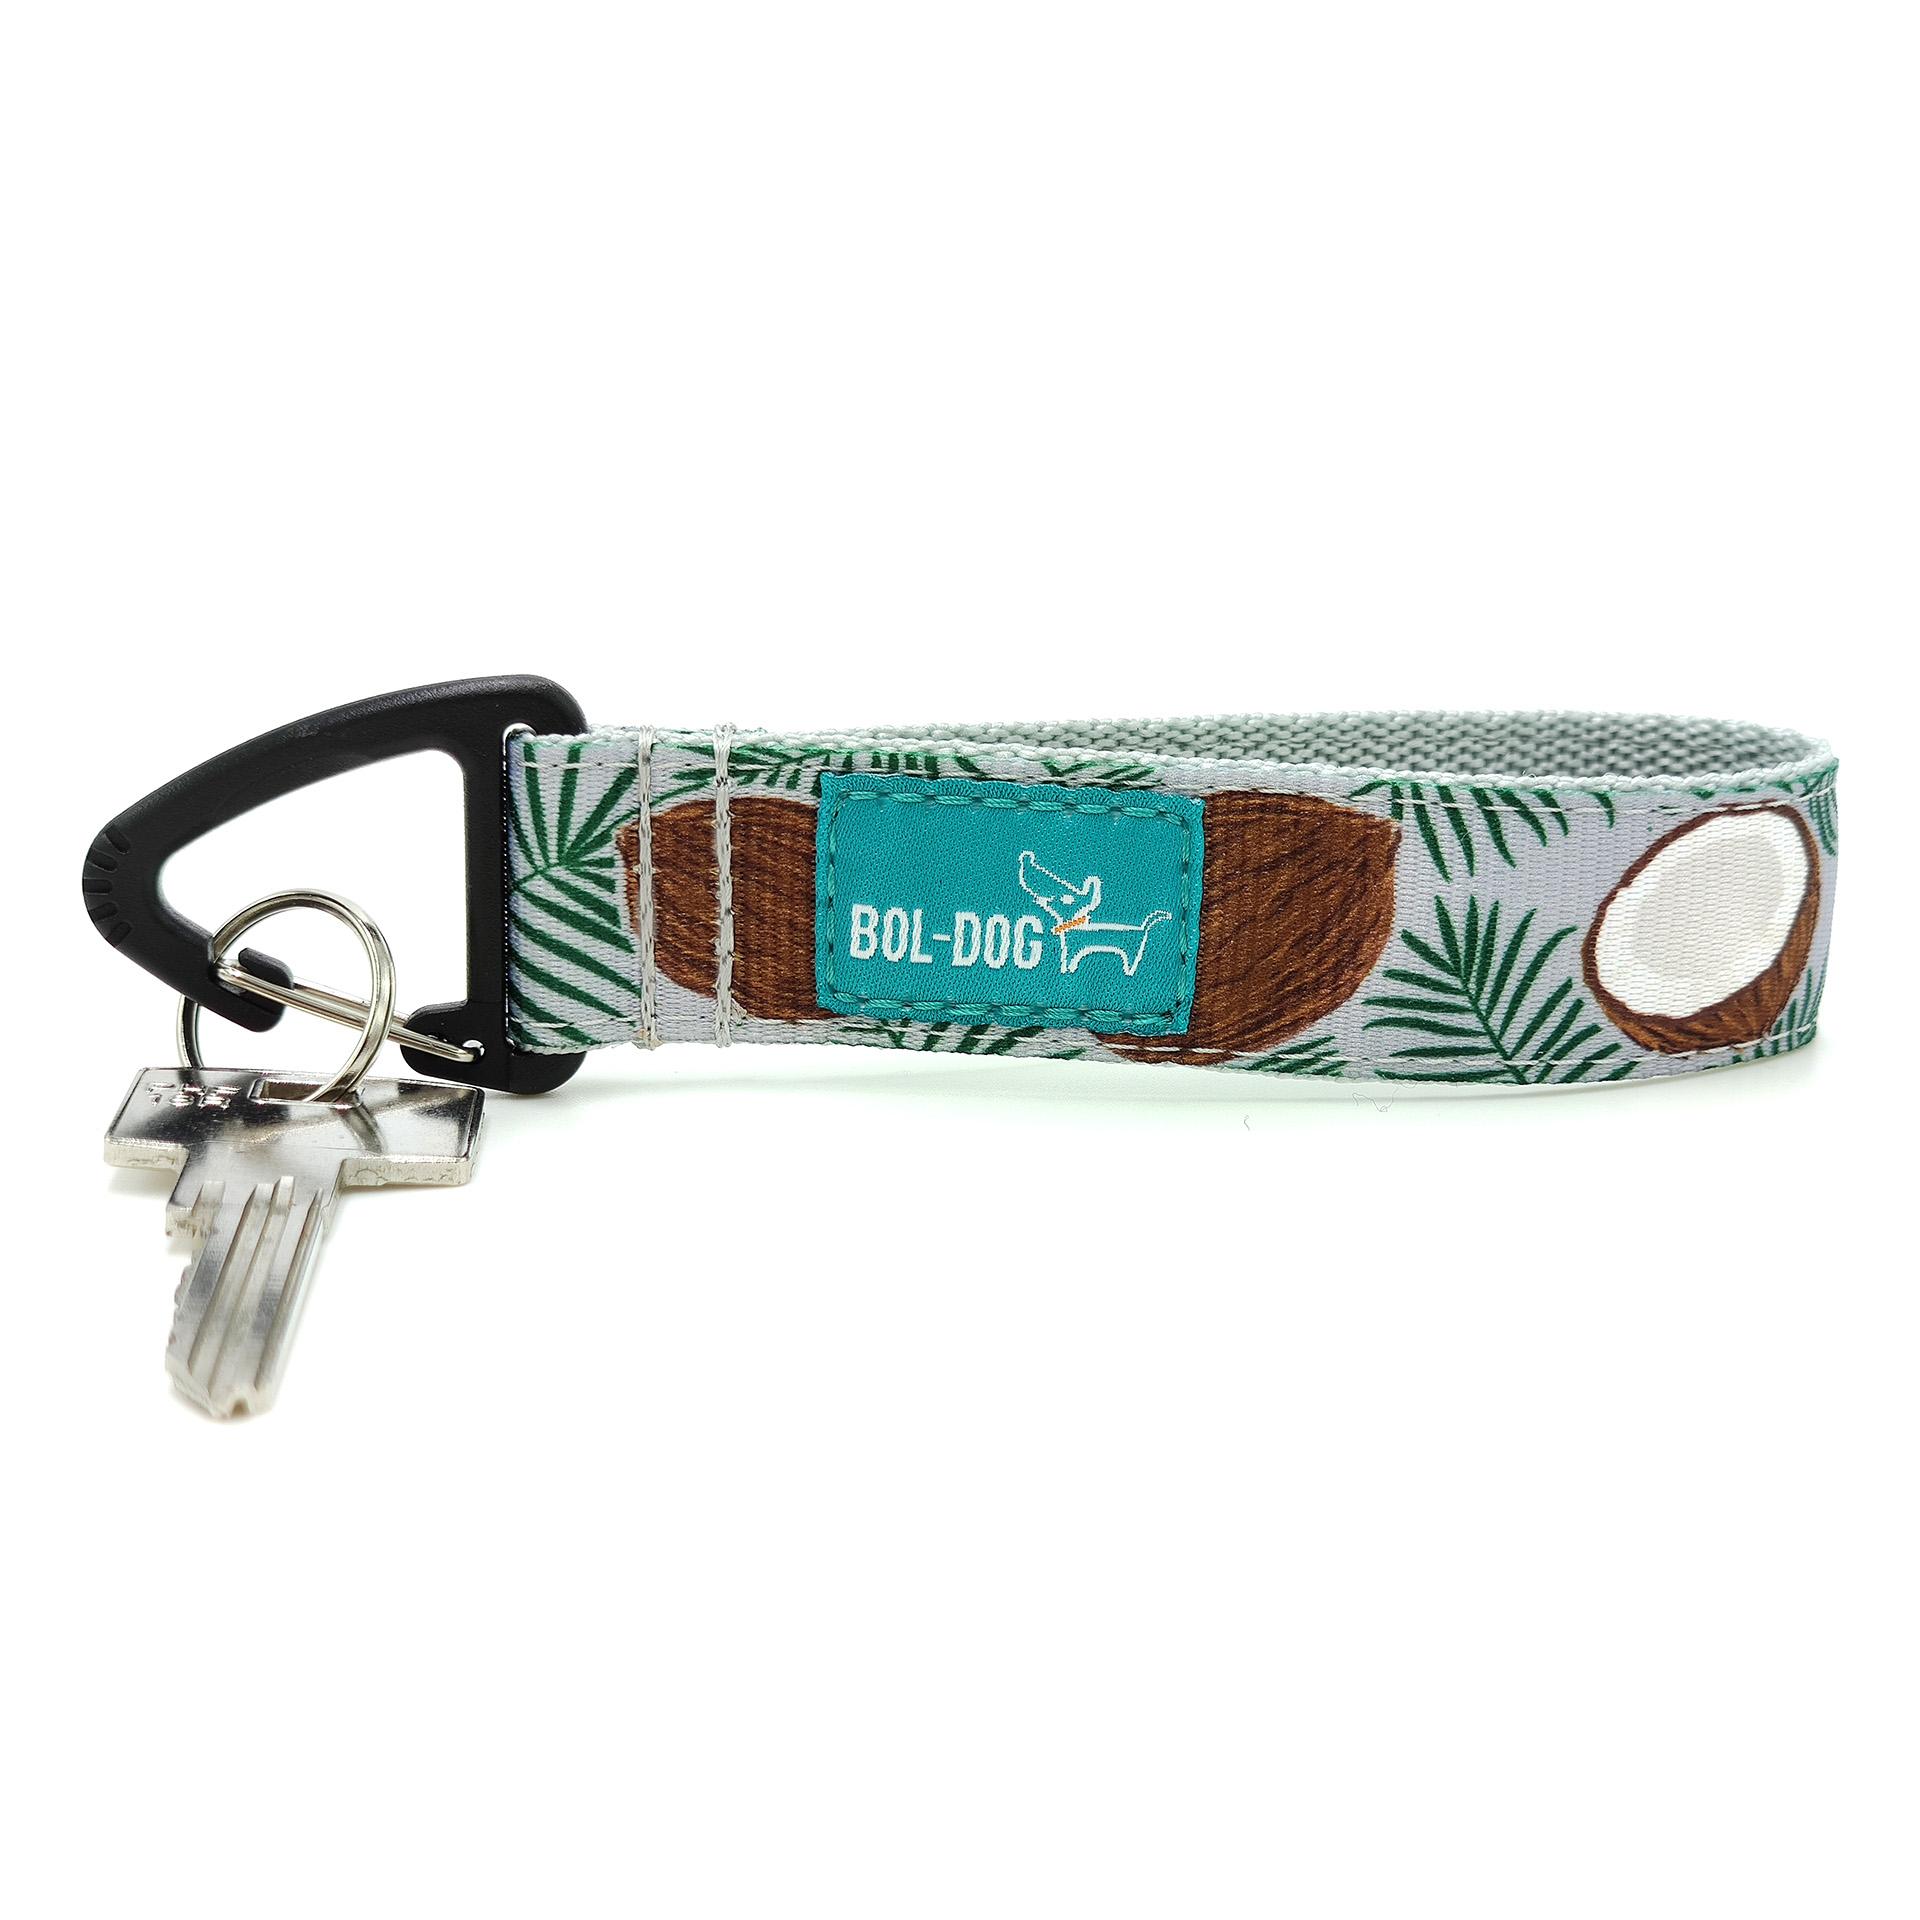 Coconut key holder